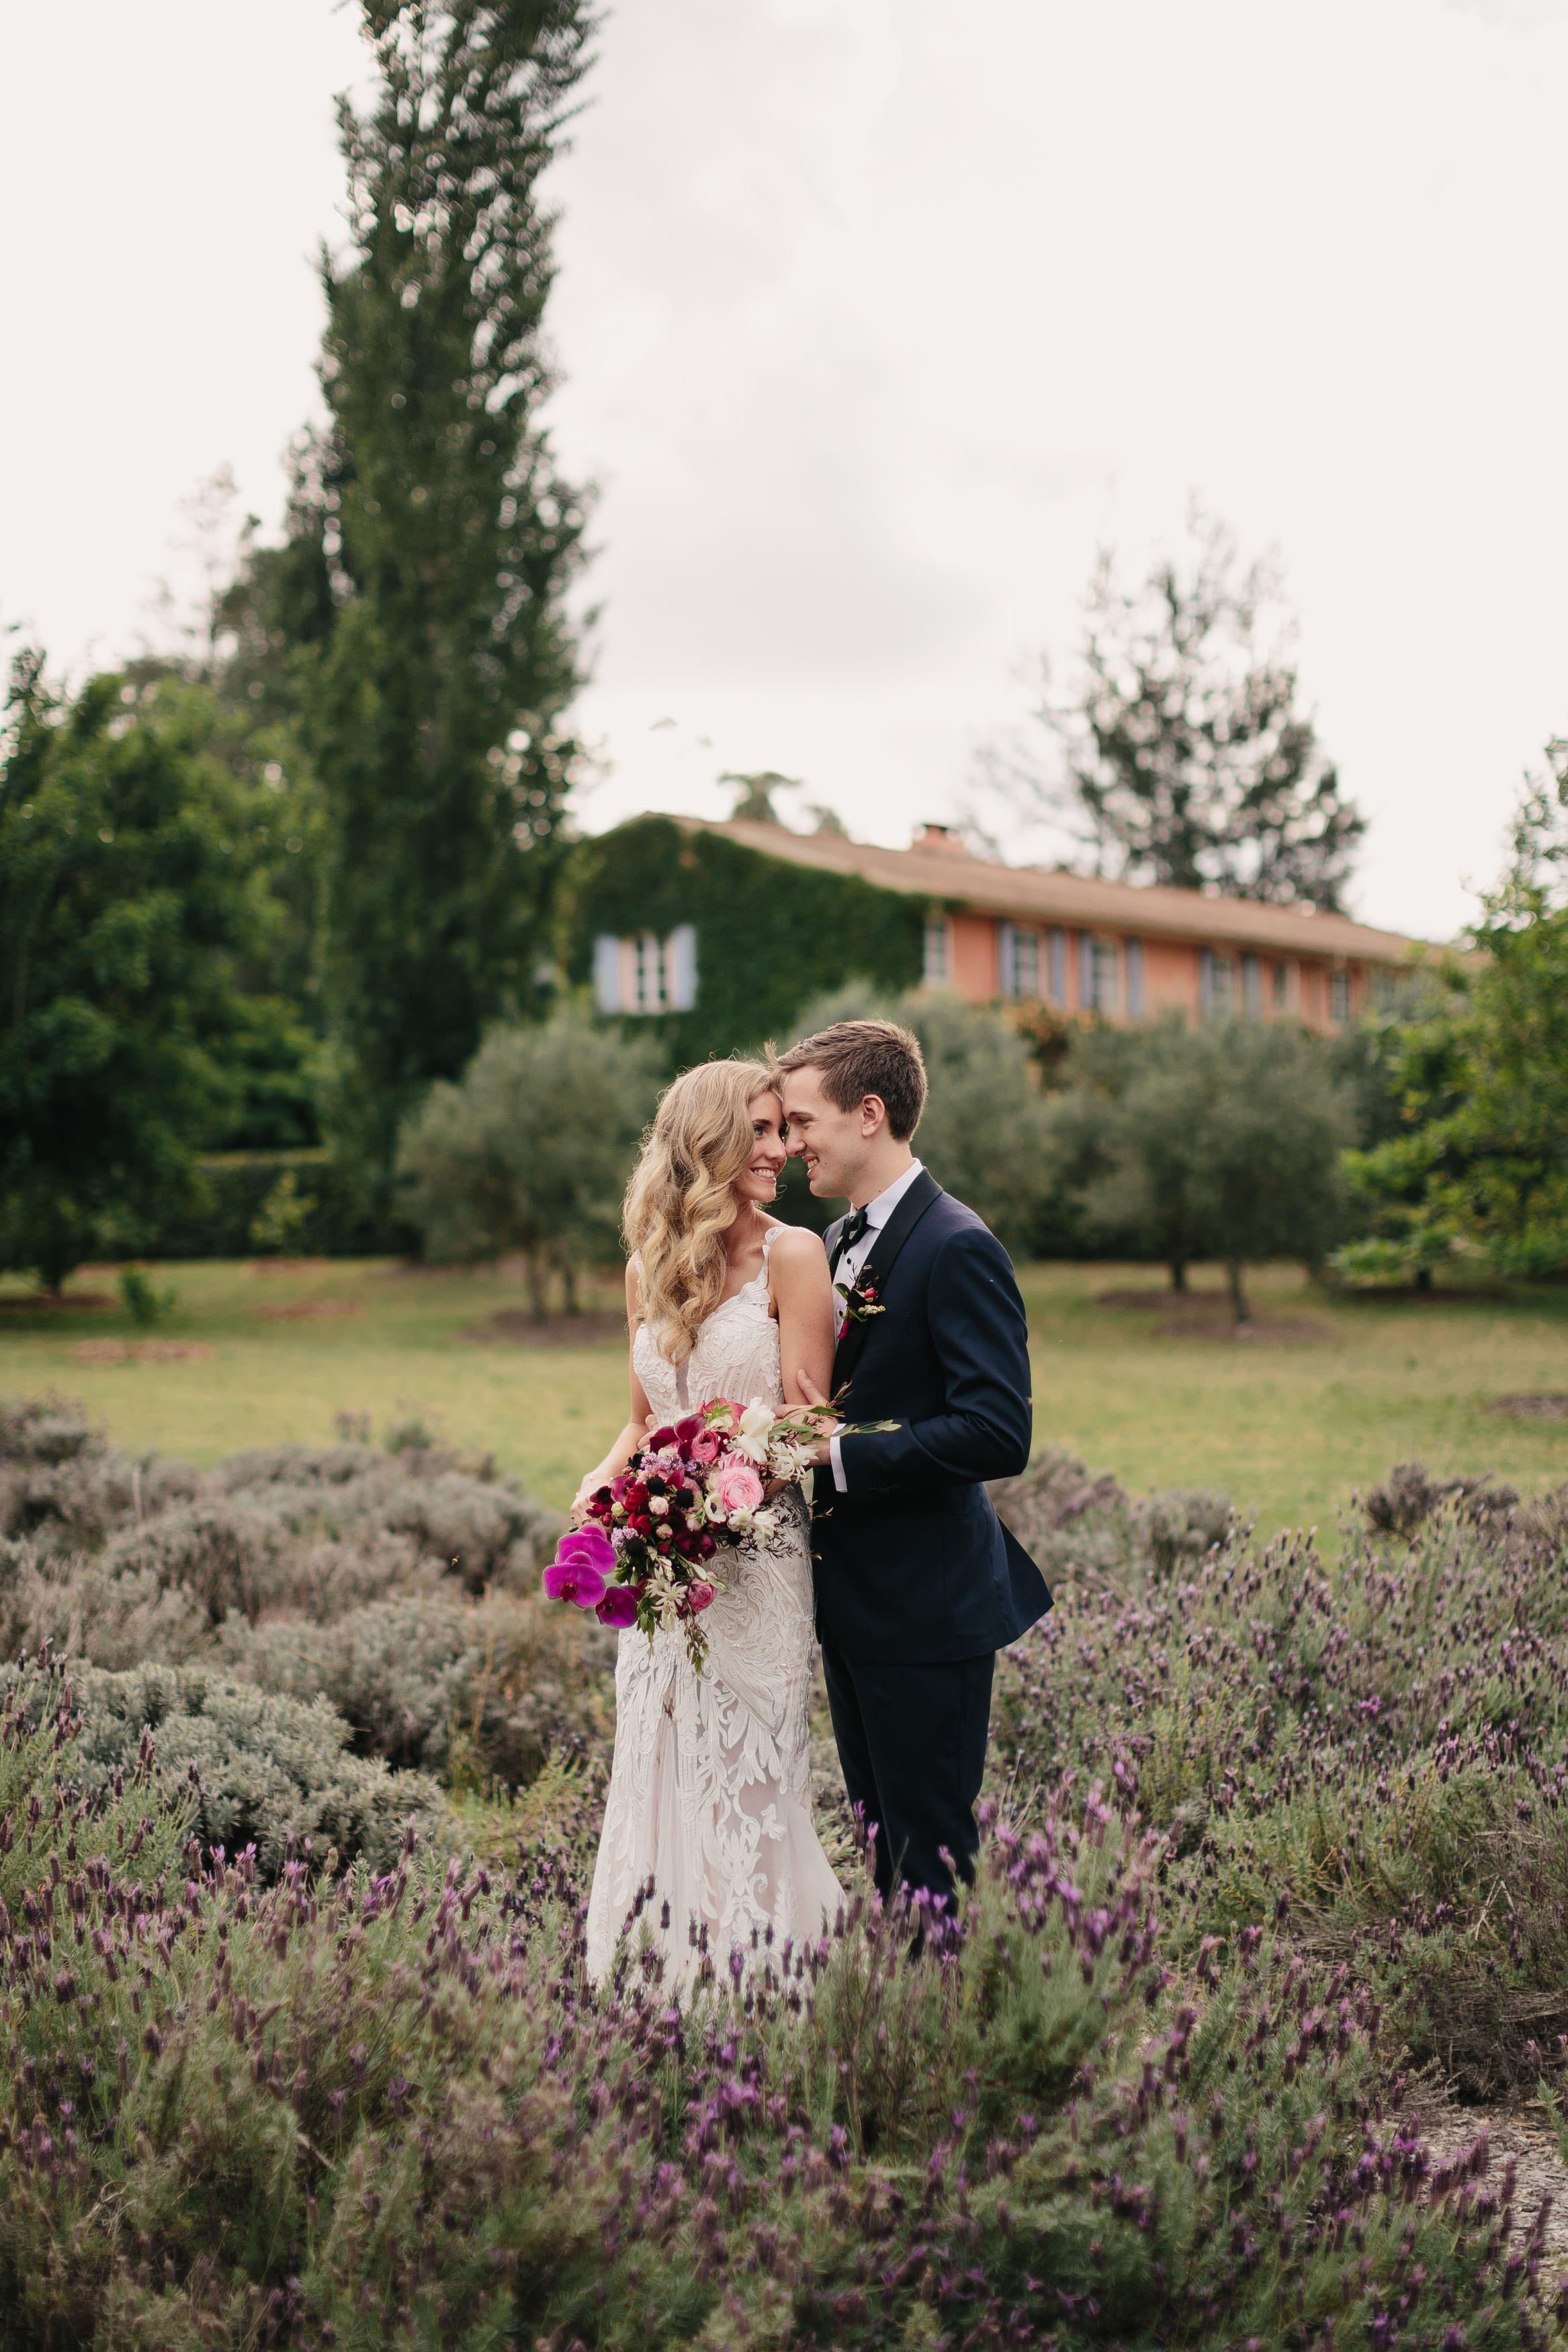 063_hunter_valley_wedding_photography_redleaf_paul_bamford_finchandoak.jpg